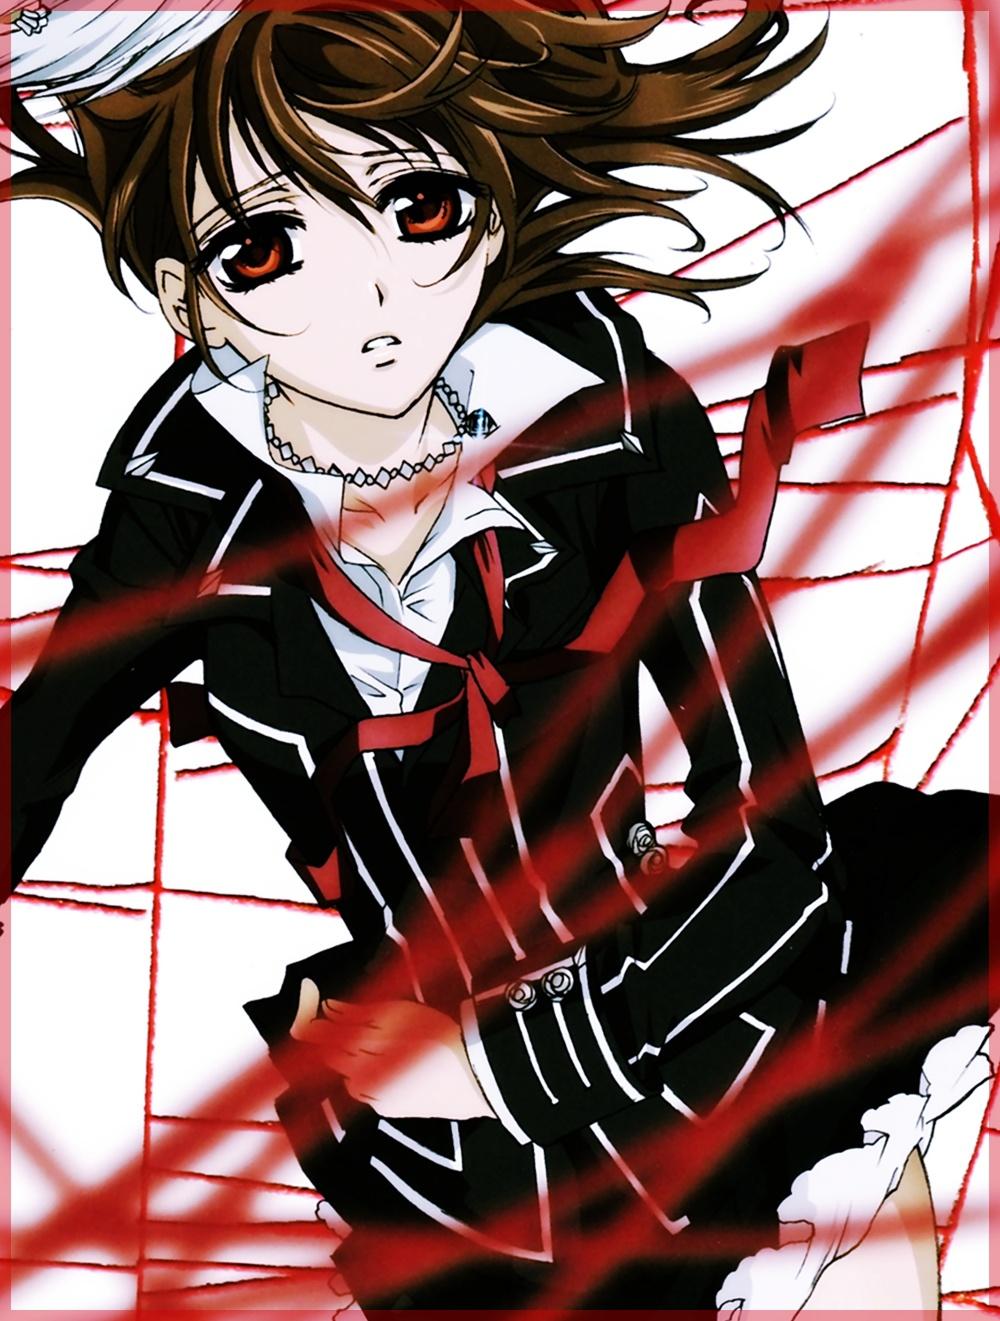 Yuki Cross/#910819 - Zerochan